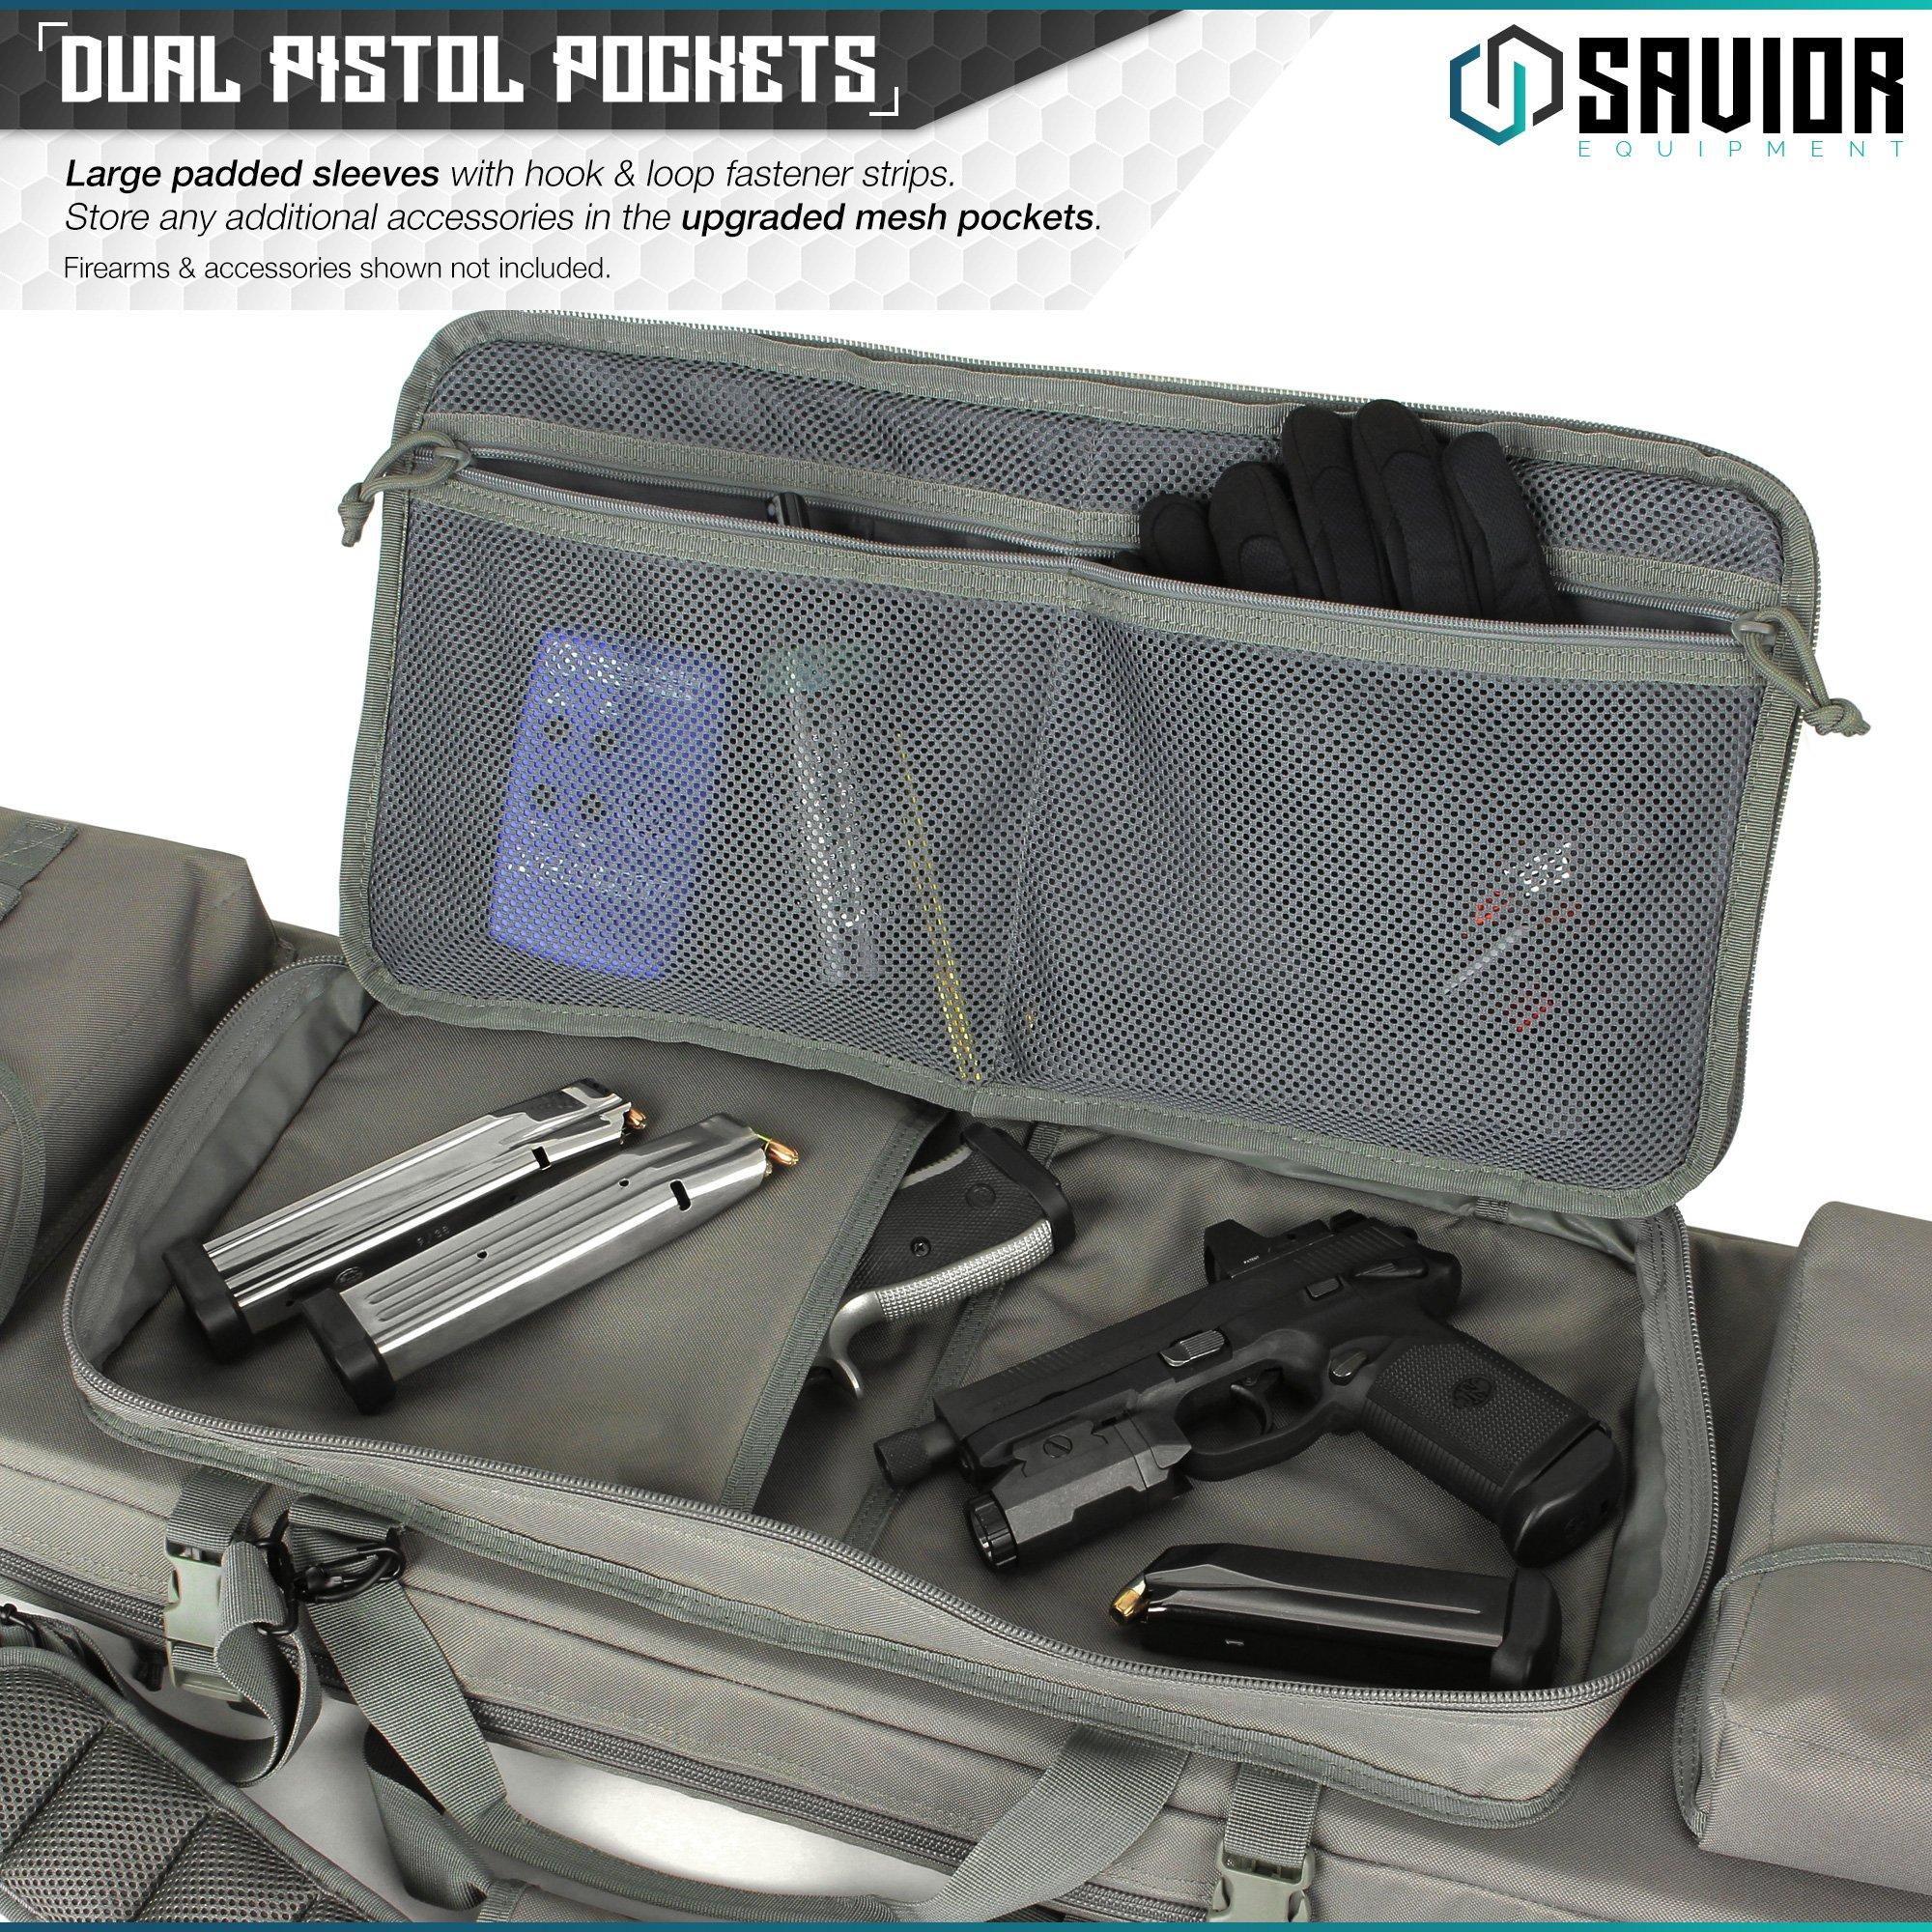 Savior Equipment Urban Warfare Tactical Double Carbine Long Rifle Bag Gun Case Firearm Backpack w/Pistol Handgun Case - 42 Inch Ash Gray by Savior Equipment (Image #4)